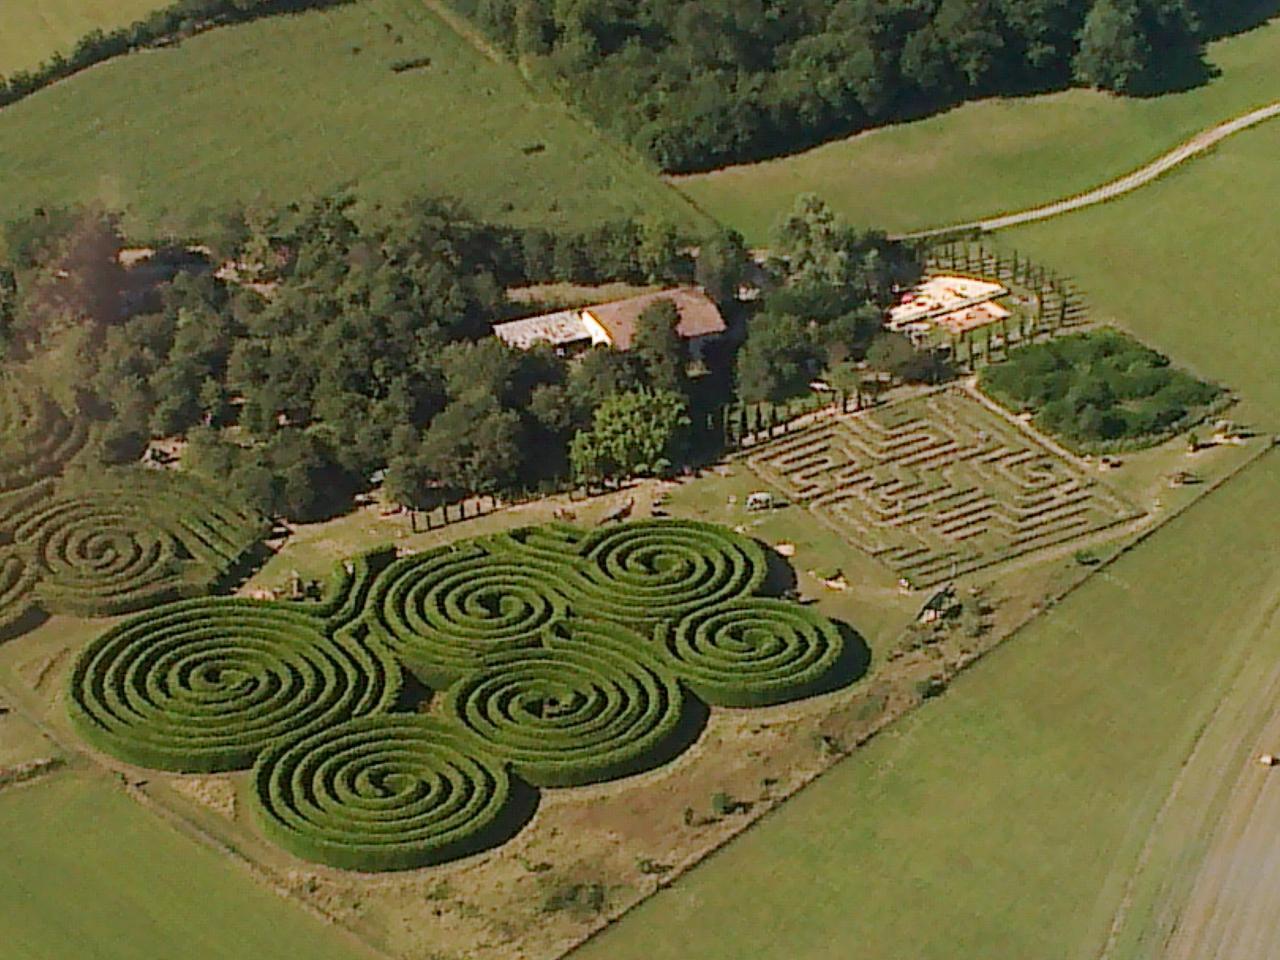 15 Labyrinthe d'Hauterives